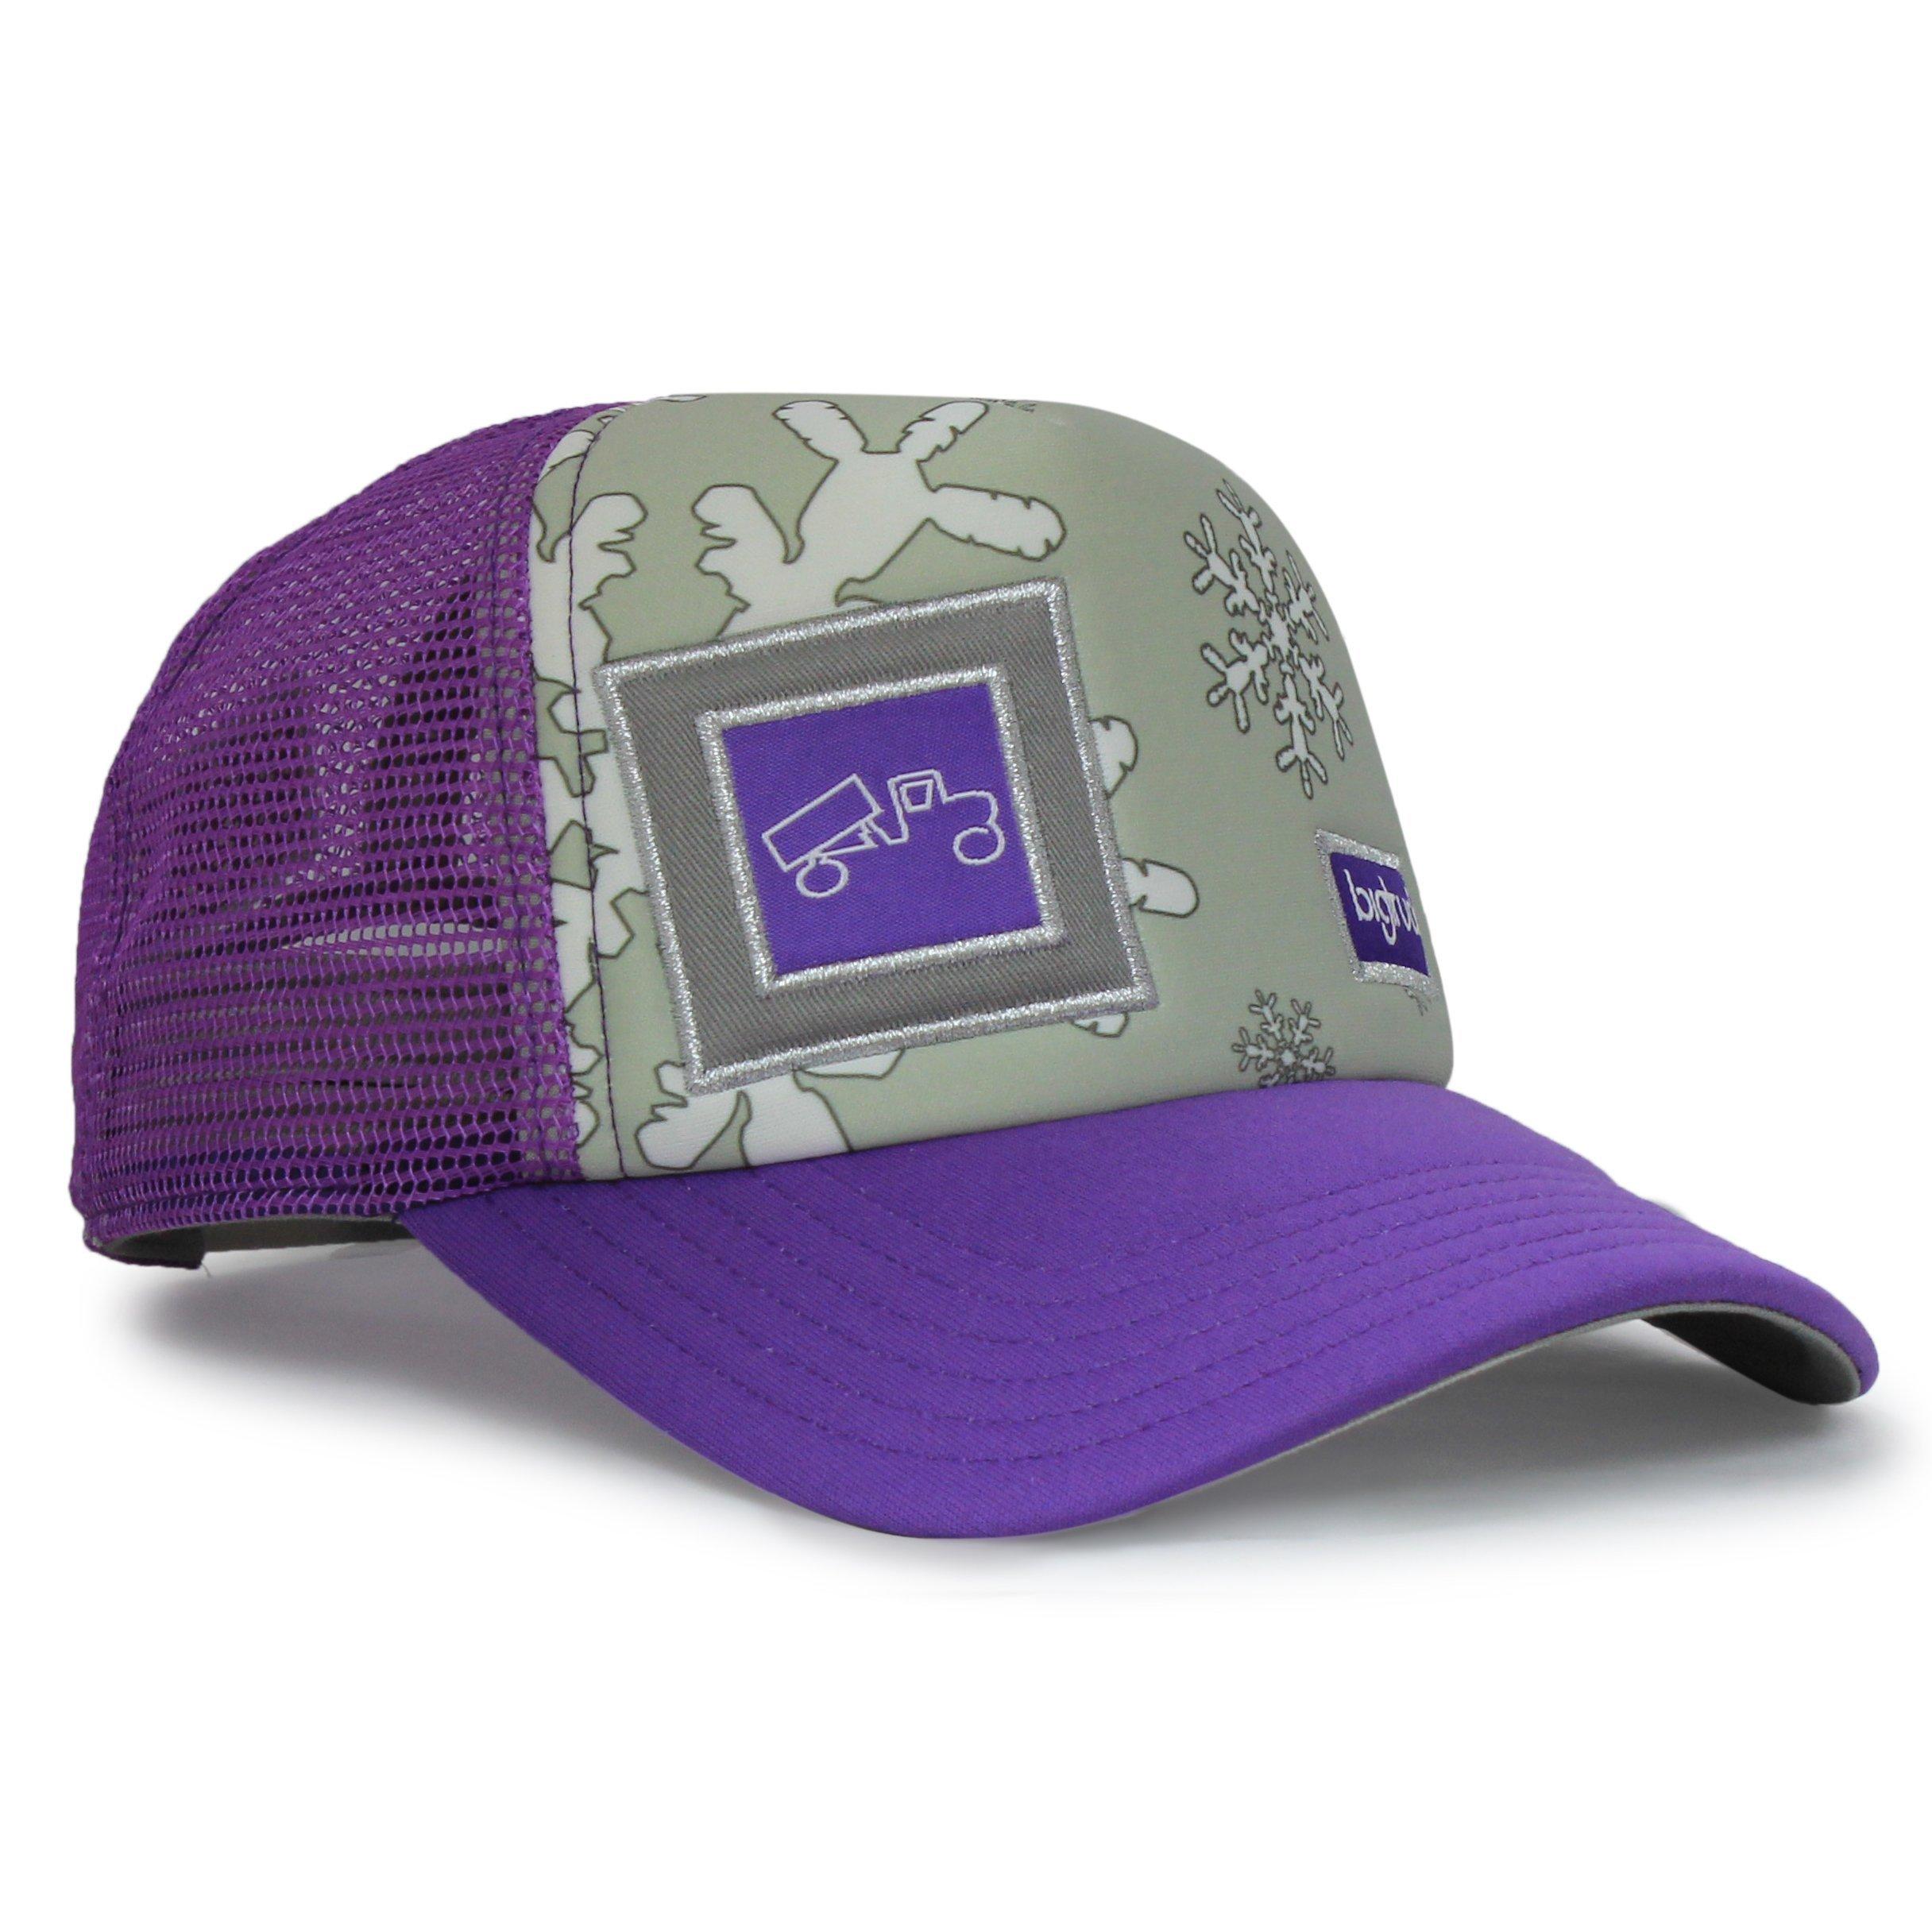 bigtruck Purple Original Kids Trucker Hat, Purple, 52cm